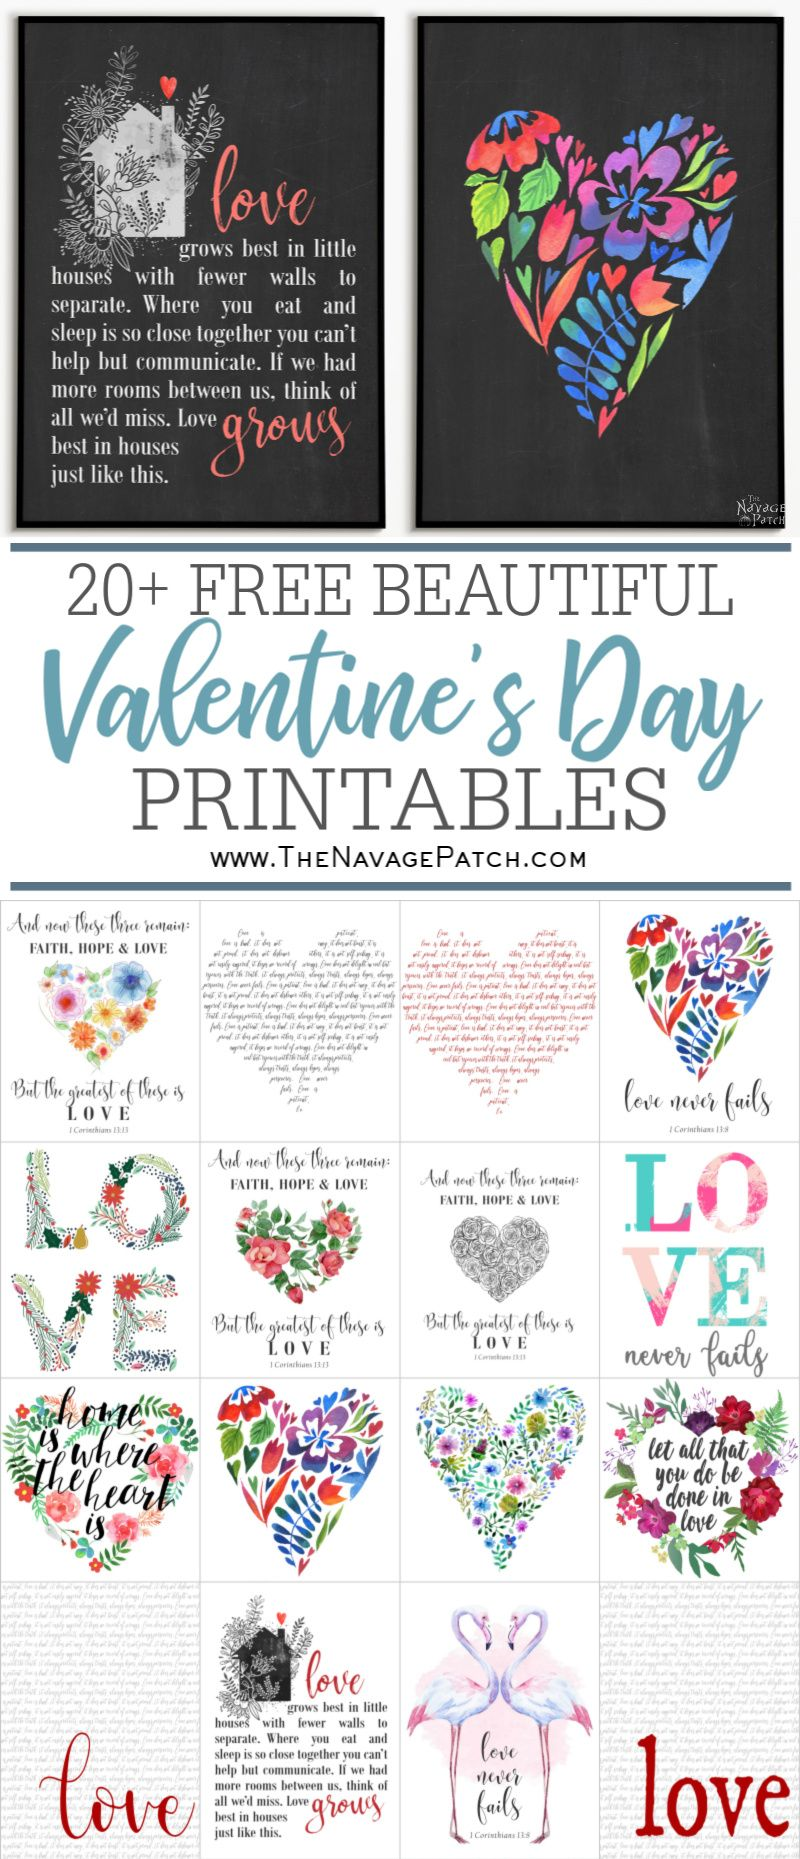 Free Valentine's Printables pin image